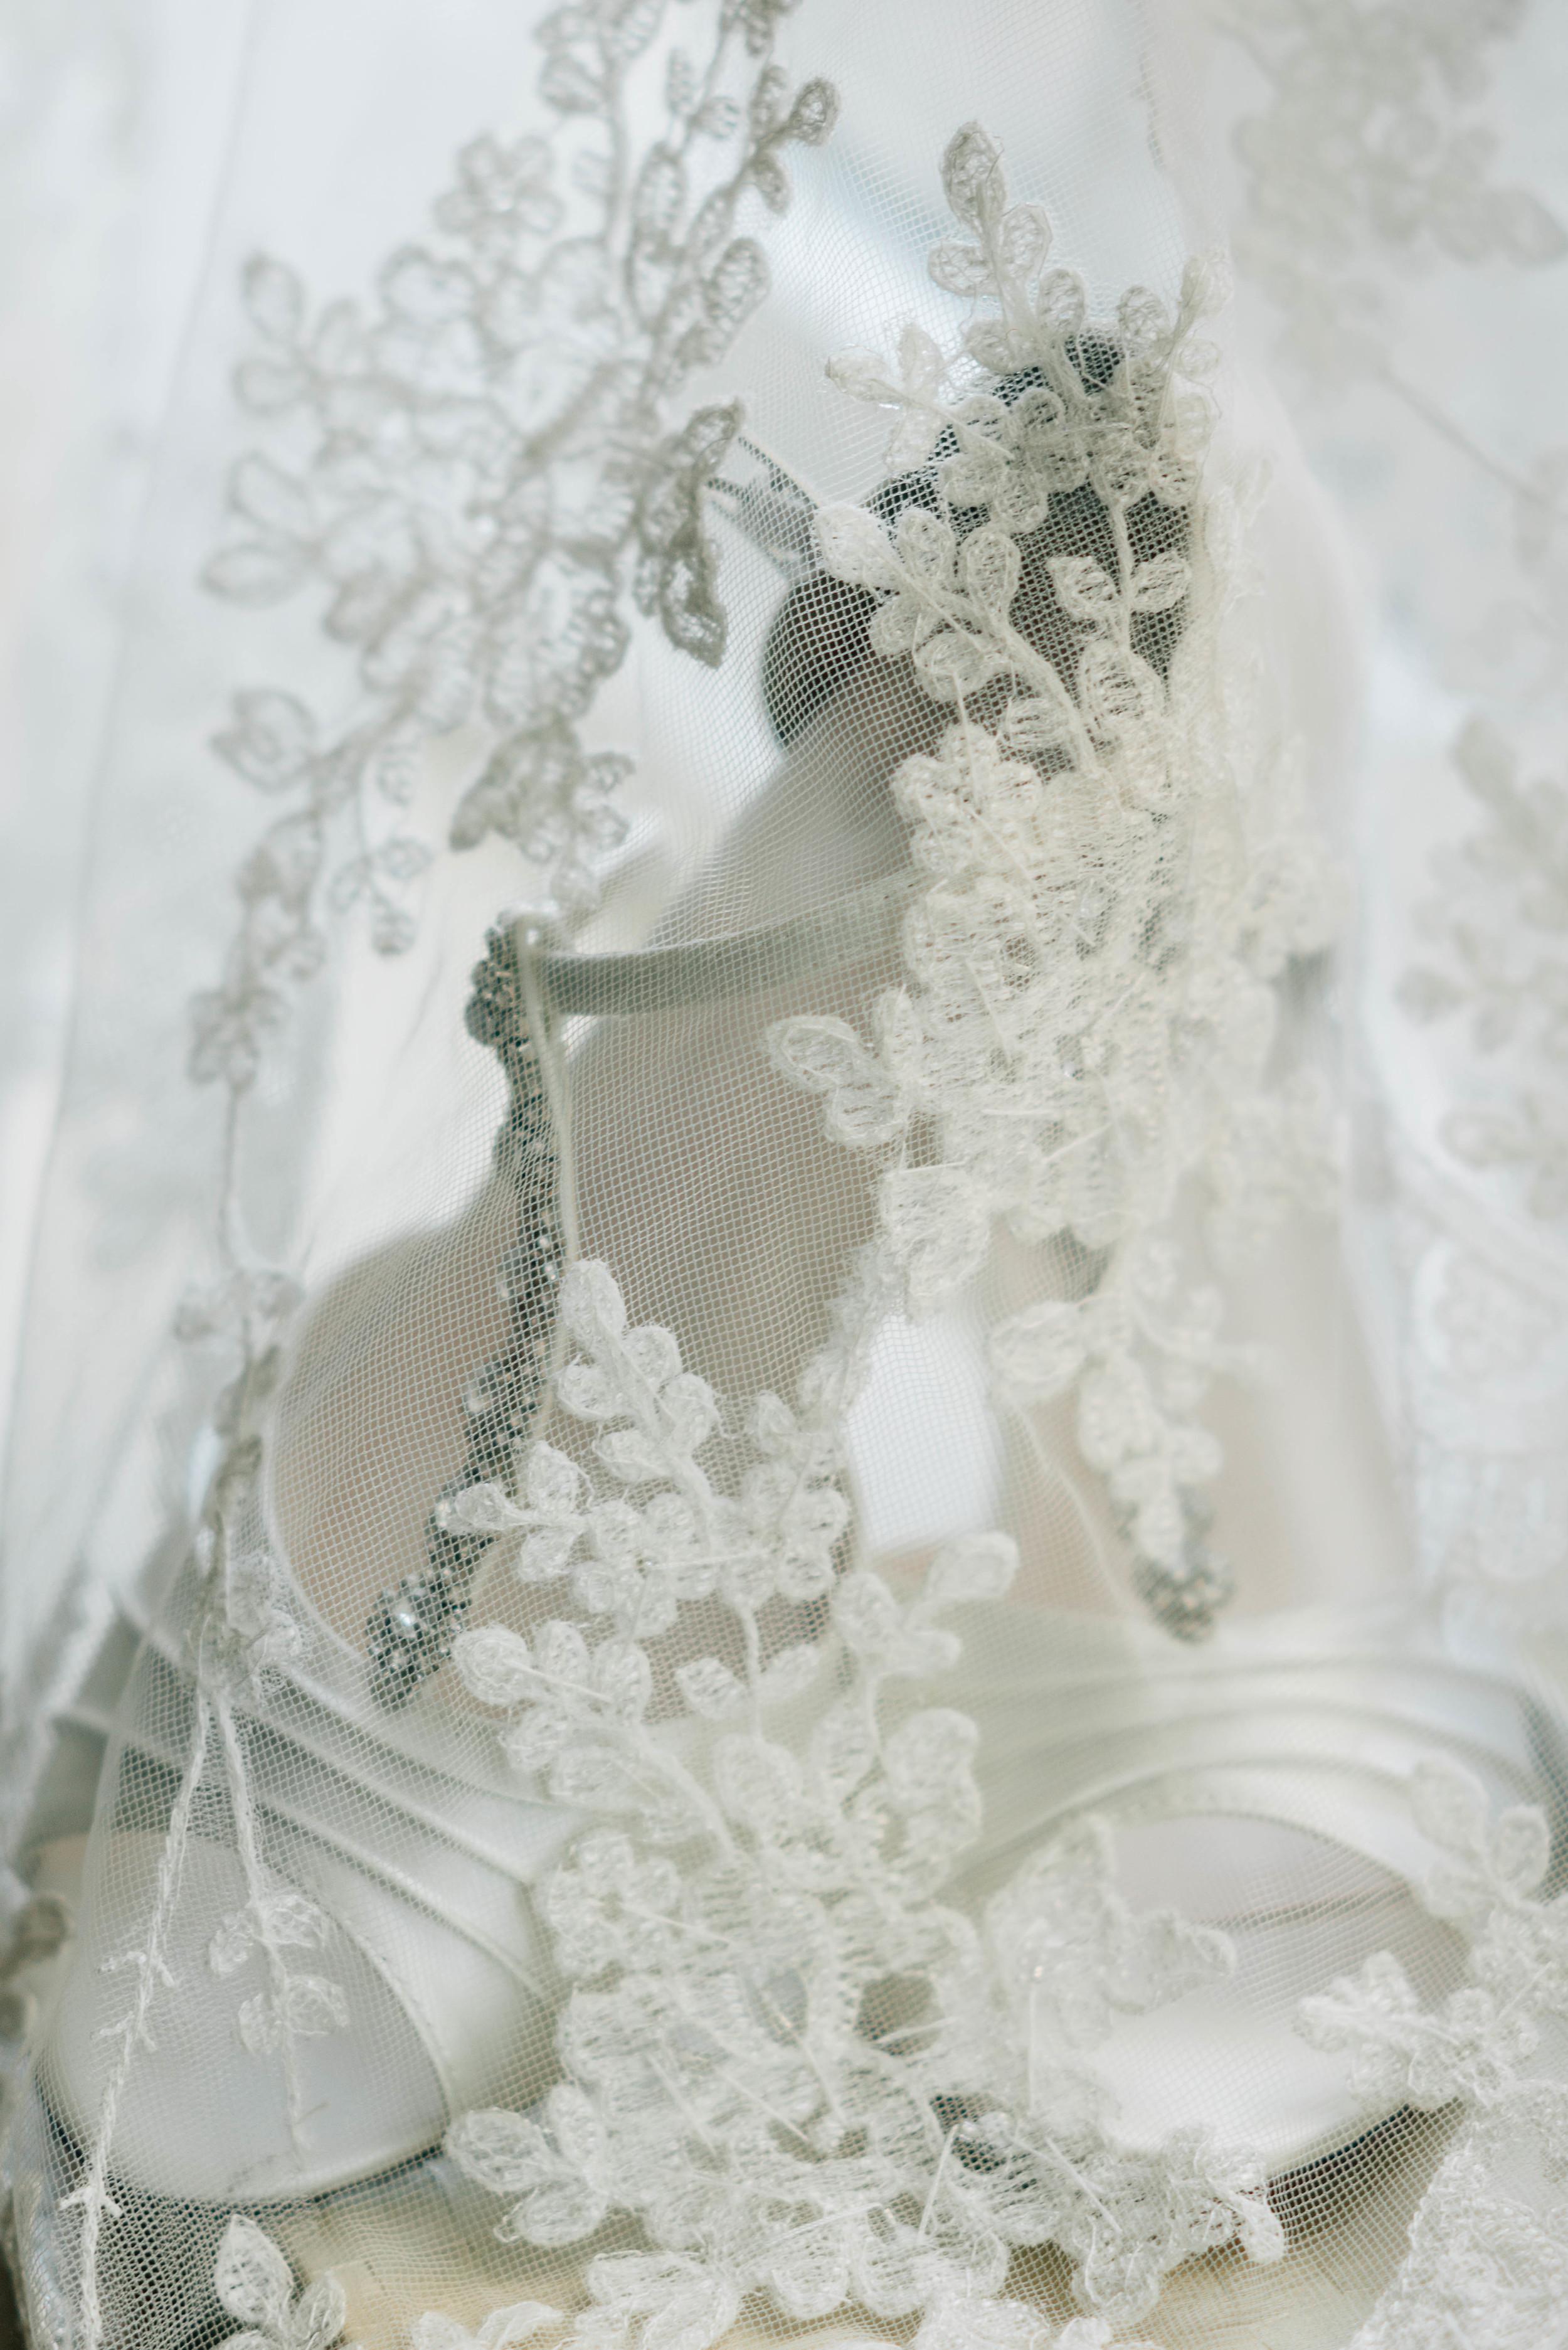 virginia-beach-best-wedding-photographer-melissa-bliss-photography-top-wedding-photographers-norfolk-portsmouth-chesapeake-sandbridge-wedding-photography